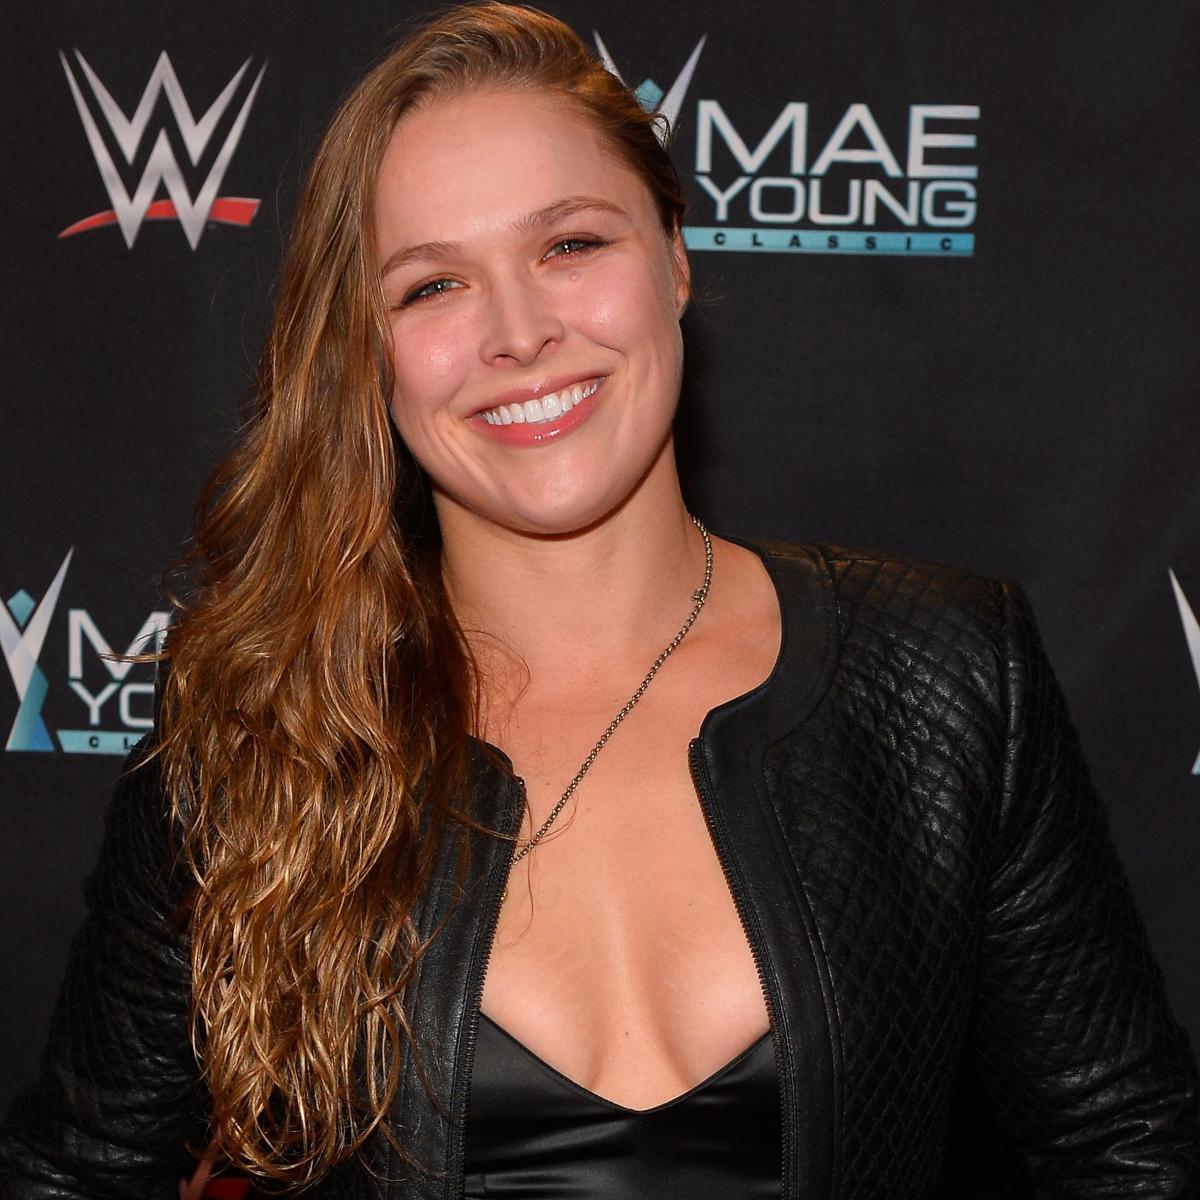 Ronda Rousey Tells Ellen DeGeneres She's Unsure of UFC Return; Enjoying WWE